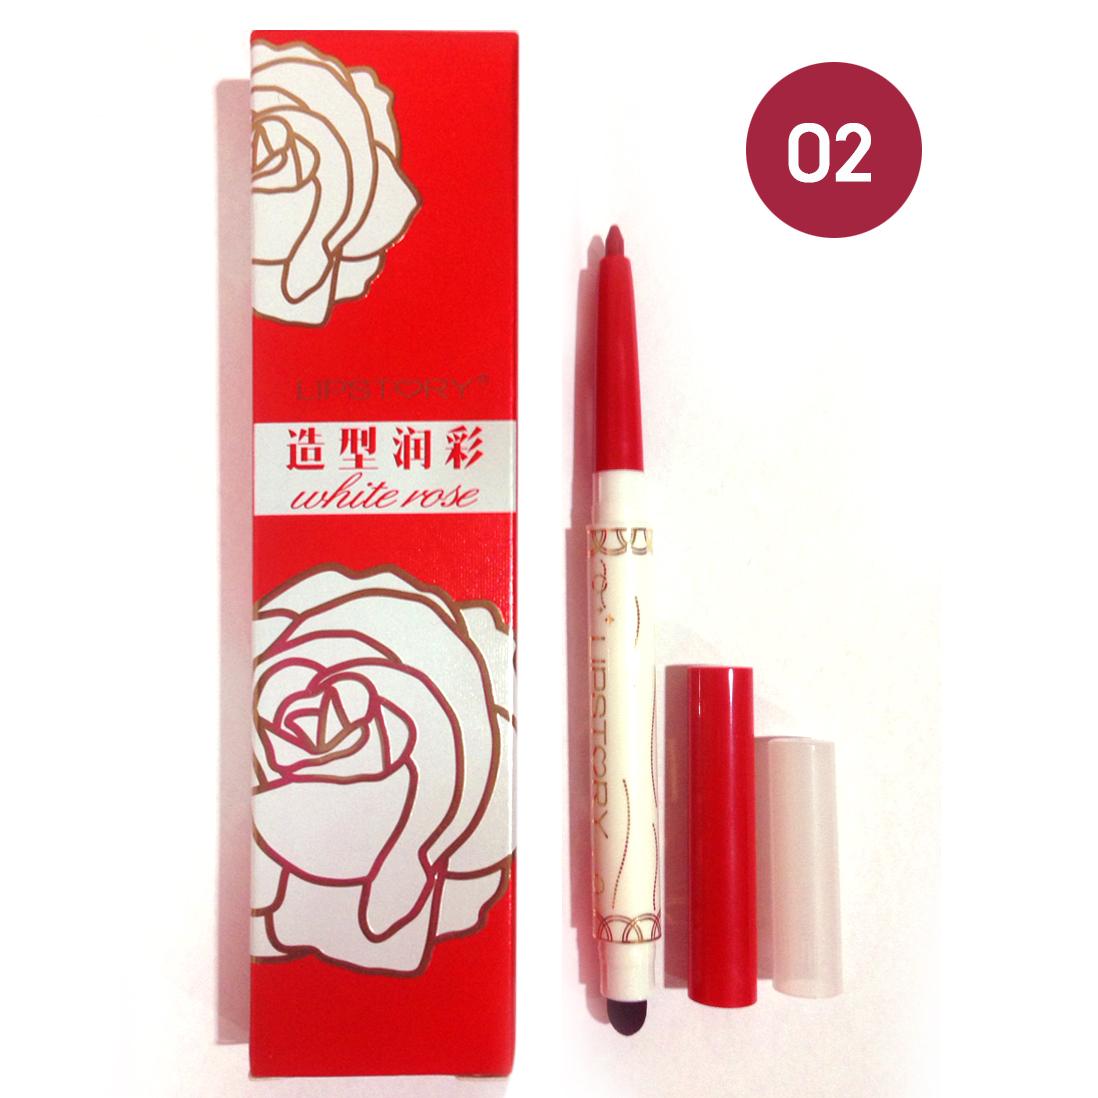 Lipstory white rose LS-728 ลิปไลเนอร์เนื้อแมทท์ เบอร์ 02 ราคาส่งถูกๆ W.30 รหัส L27